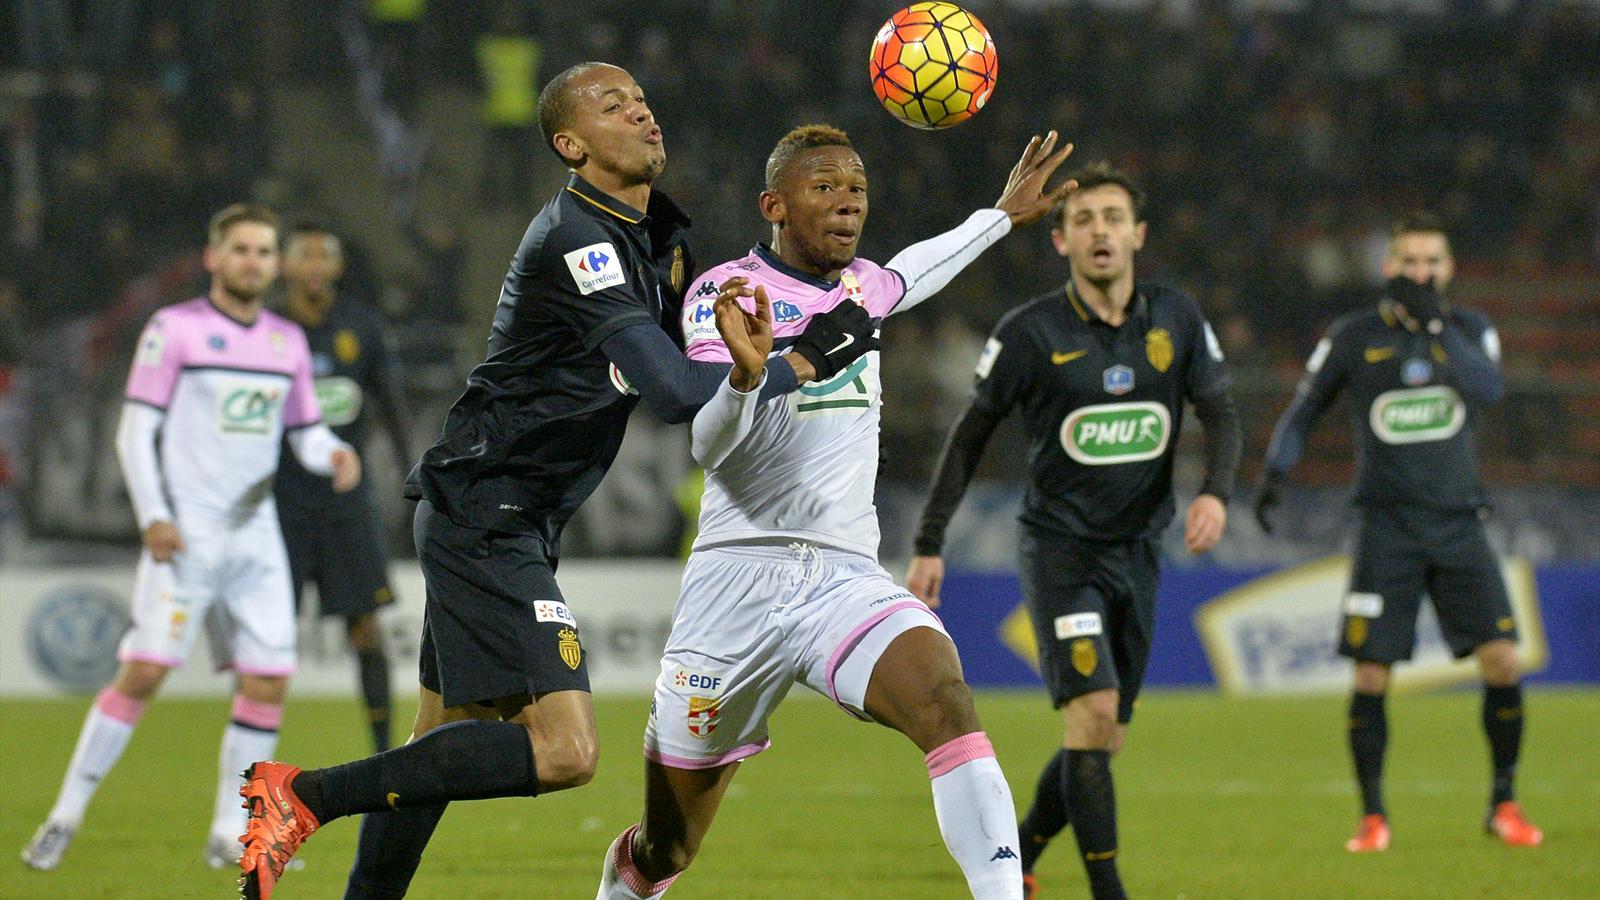 Monaco d nonce un calendrier ubuesque coupe de france - Calendrier de la coupe de france 2015 ...